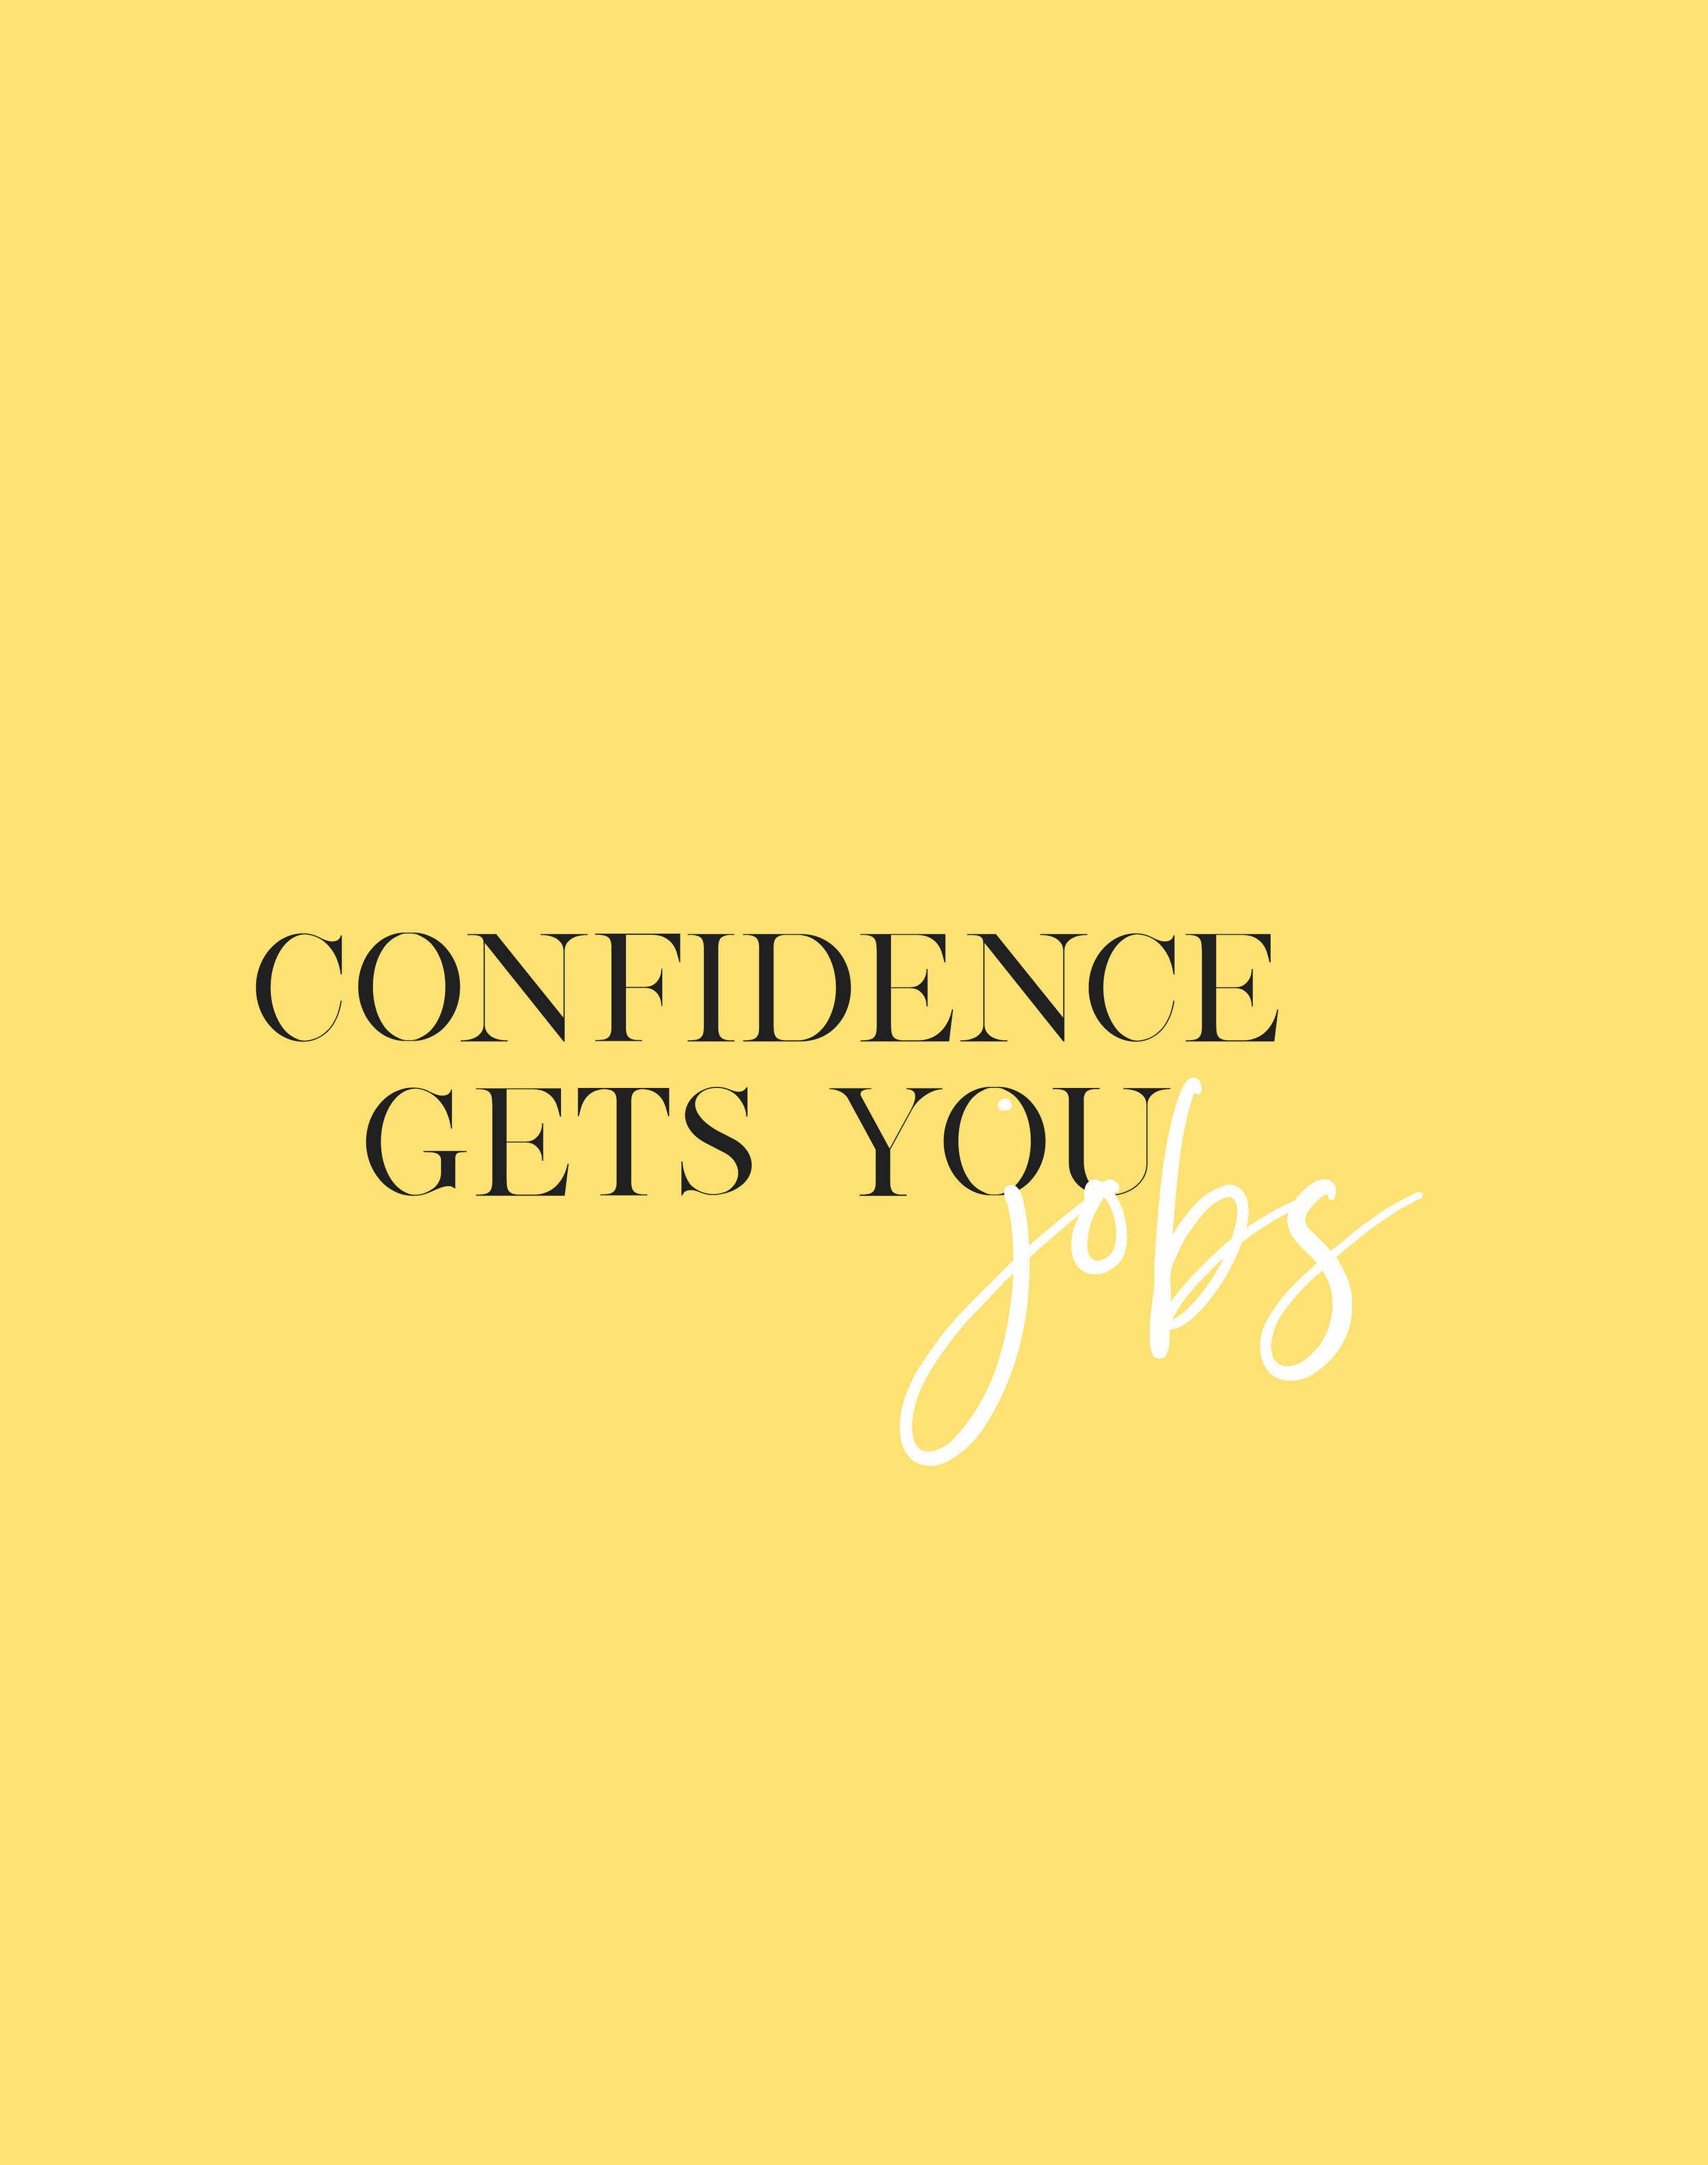 confidencegetsyoujobs copy 2.jpg